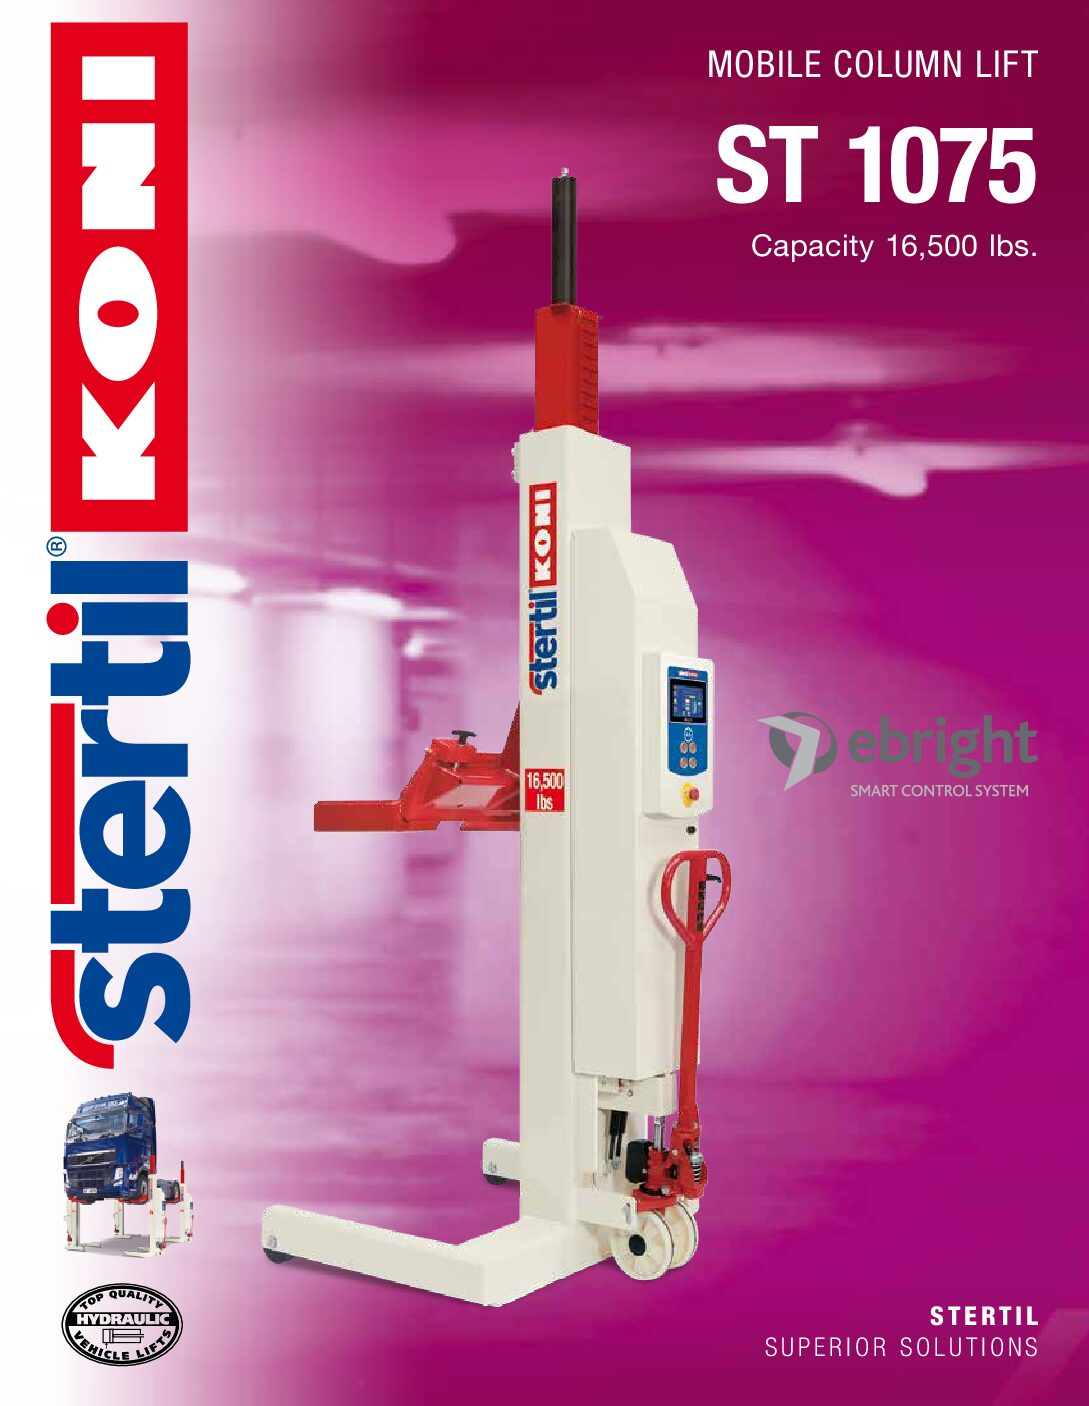 Stertil-Koni: ST 1075 – US Version